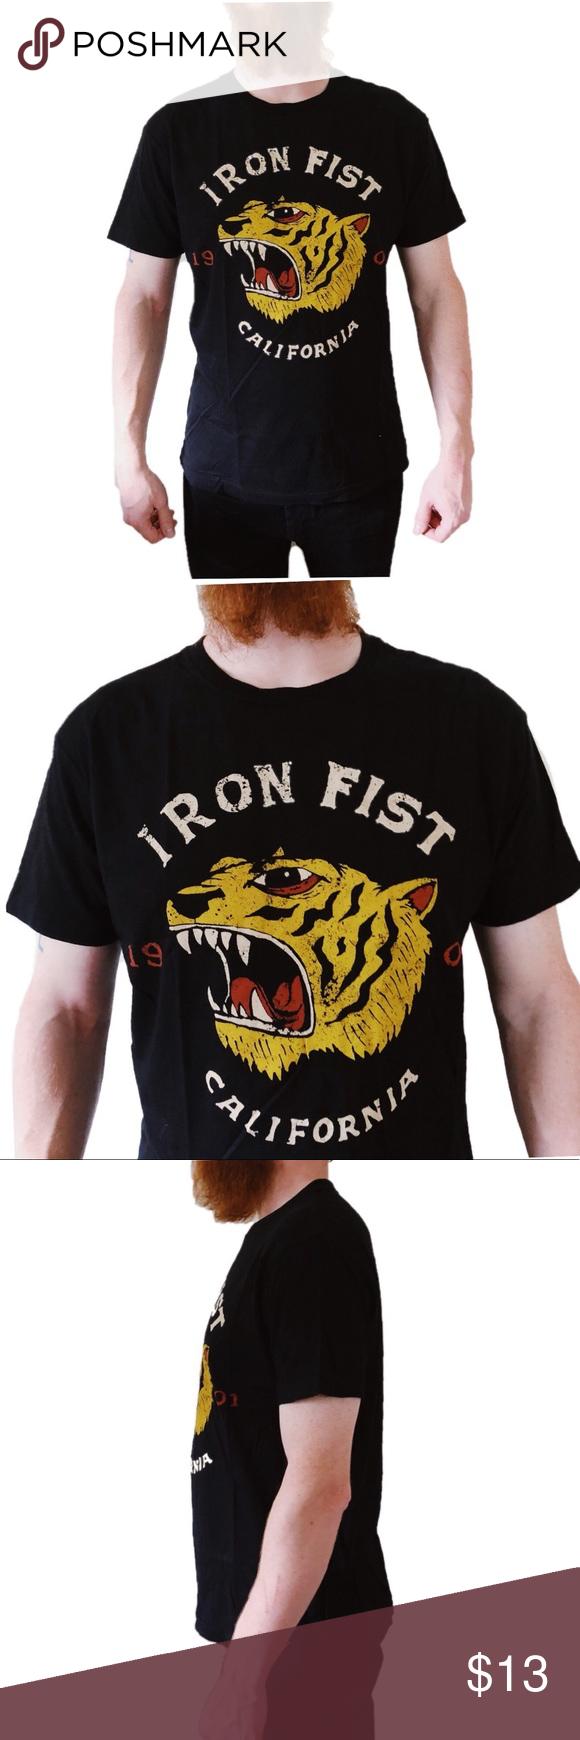 Men's Iron Fist Rumbler Graphic Logo Shirt Boutique Logo